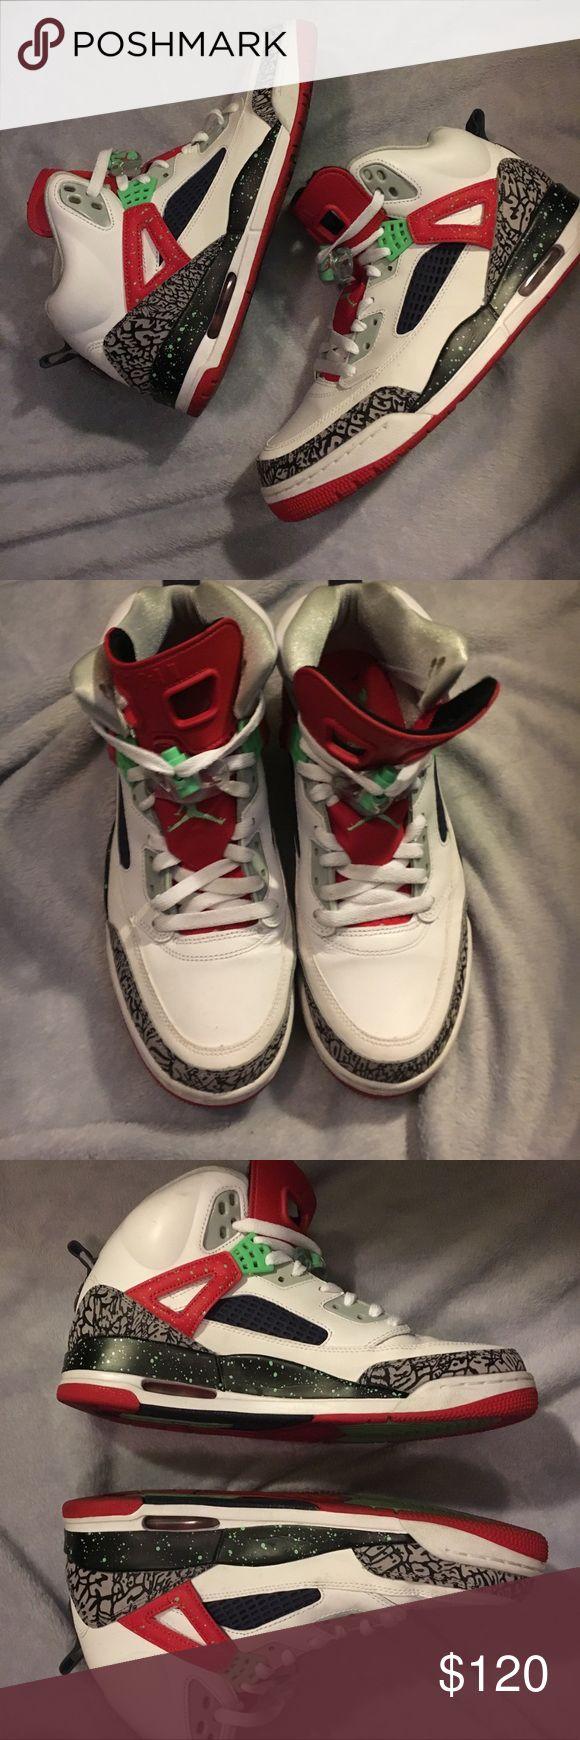 Jordan spizike green university red Jordan spizike green university red  gently worn. Inner left has minor scratch. Jordan Shoes Sneakers